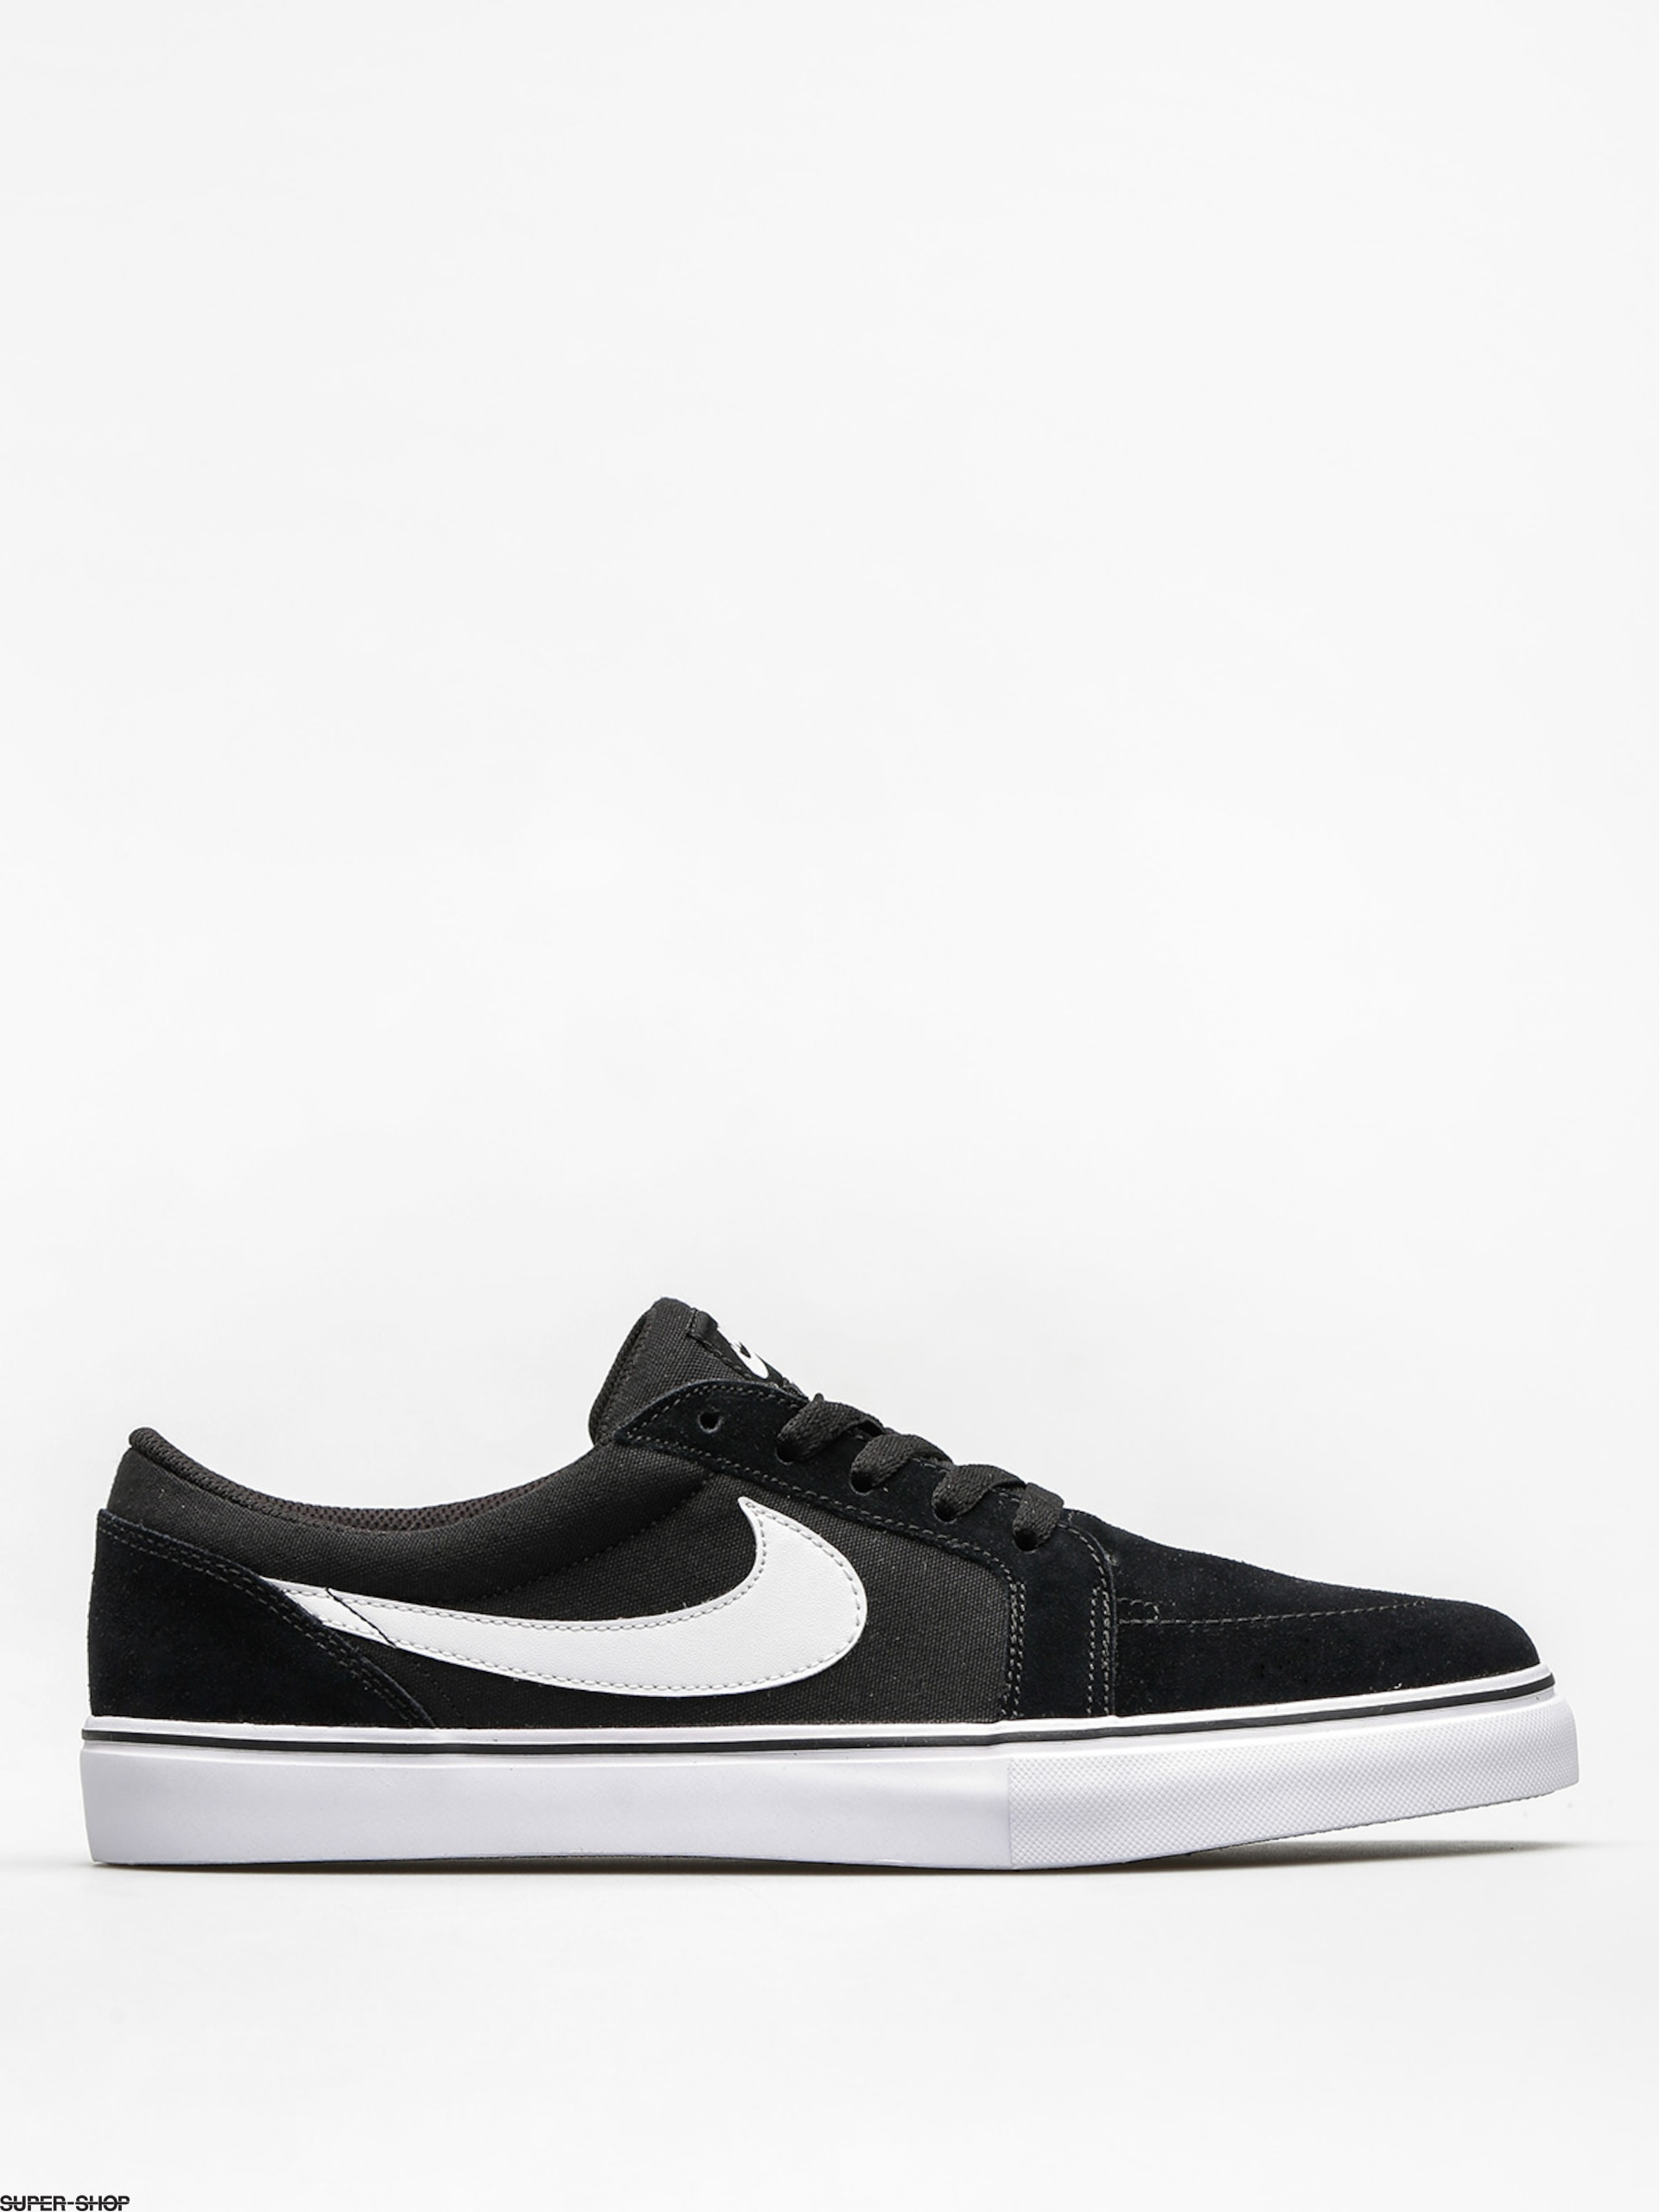 Nike Sb Shoes Nike Sb Satire Ii Black White